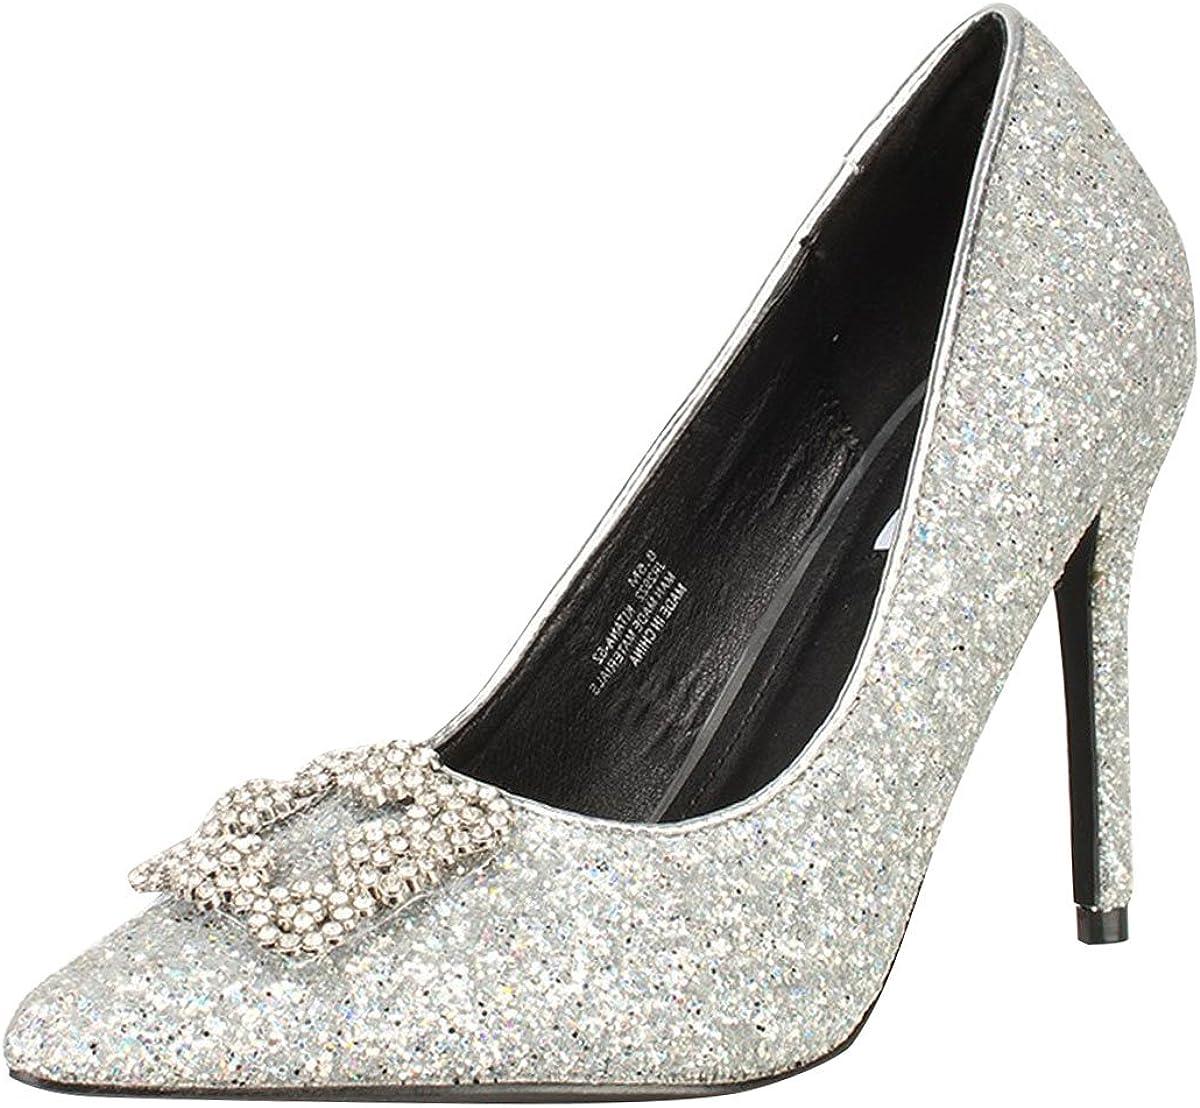 Women Shoe Cape Robbin Kitana 25 Closed Toe Buckle Embellished Pump Denim  *New*